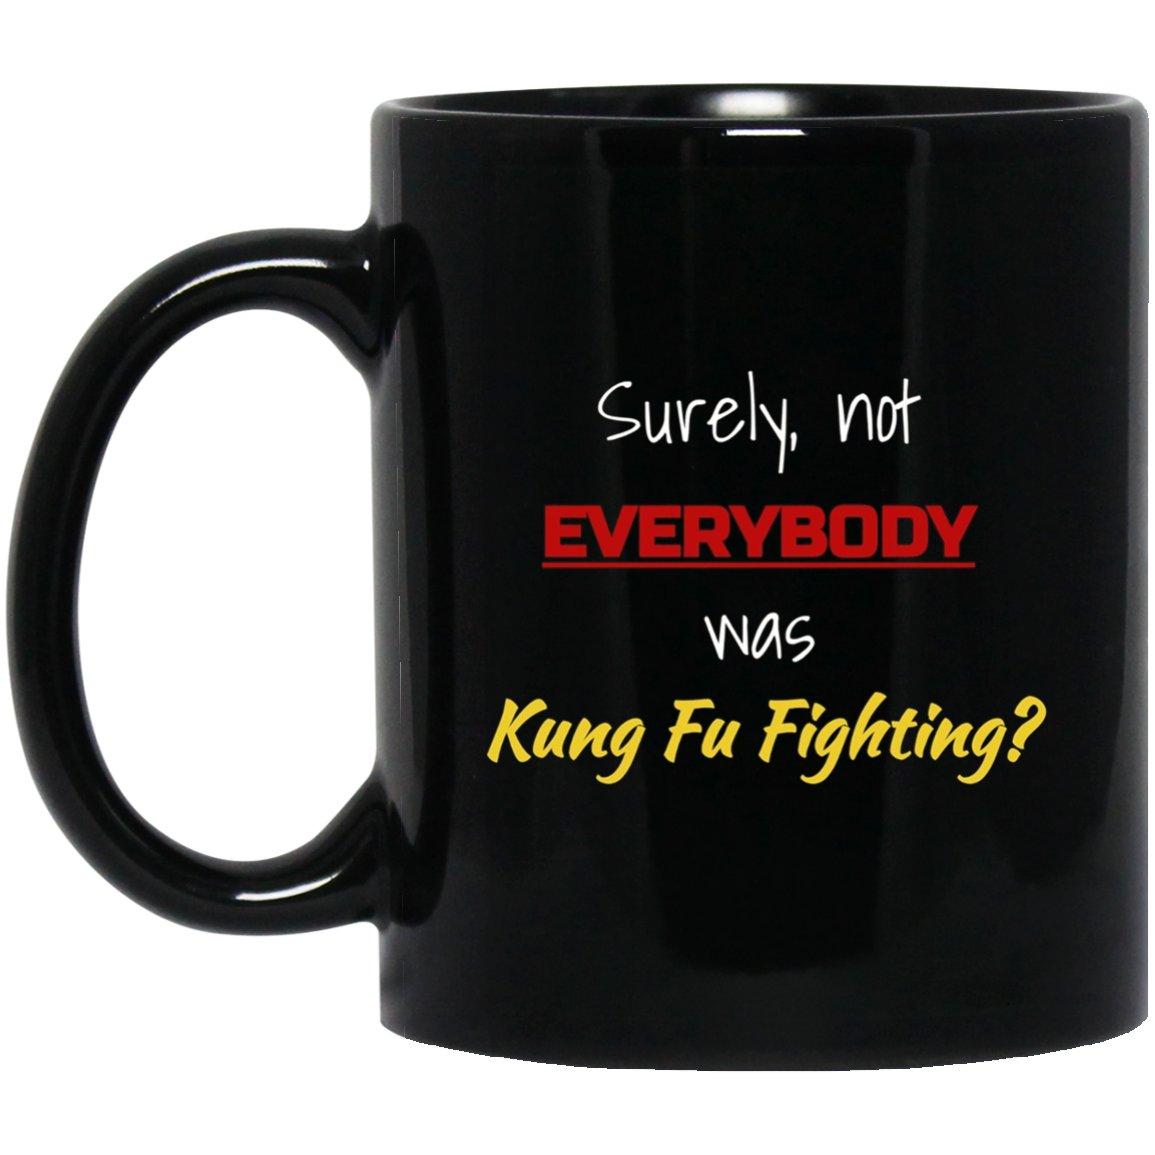 Surely, not EVERYBODY was Kung Fu Fighting Funny Black  Mug Black Ceramic 11oz Coffee Tea Cup